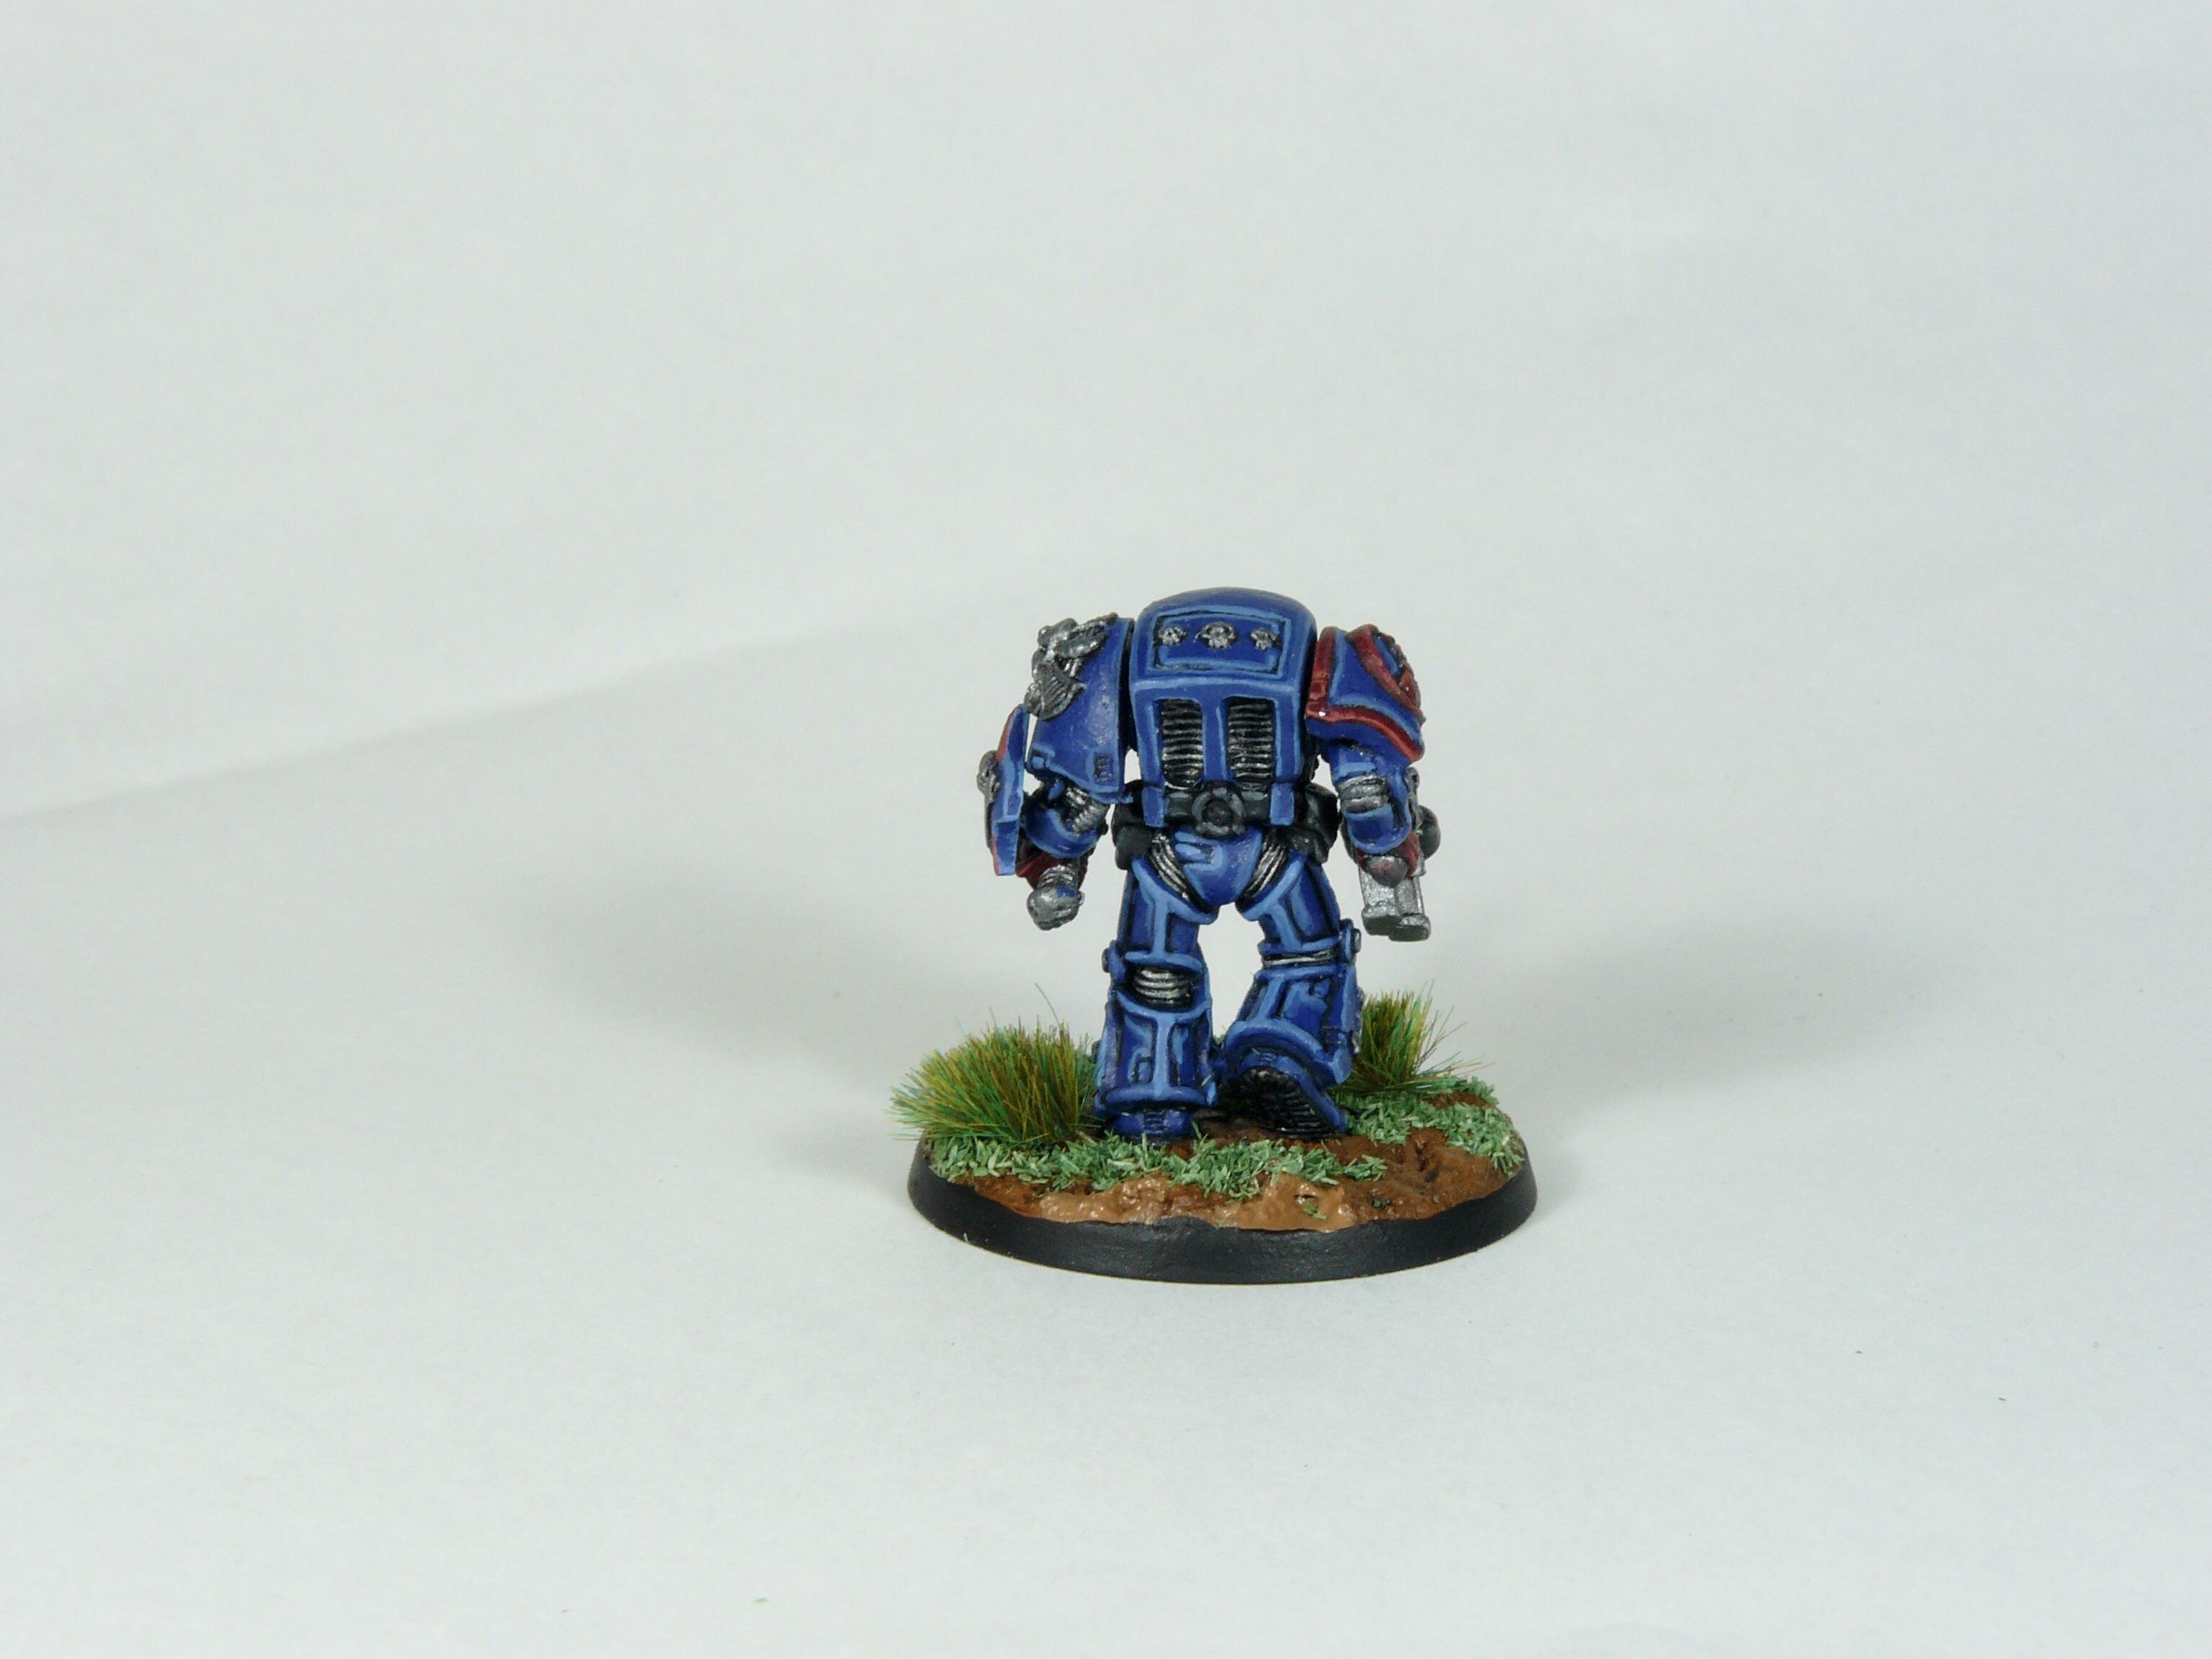 Librarian, Rogue Trader, Rtb9, Space Marines, Terminator Armor, Warhammer 40,000